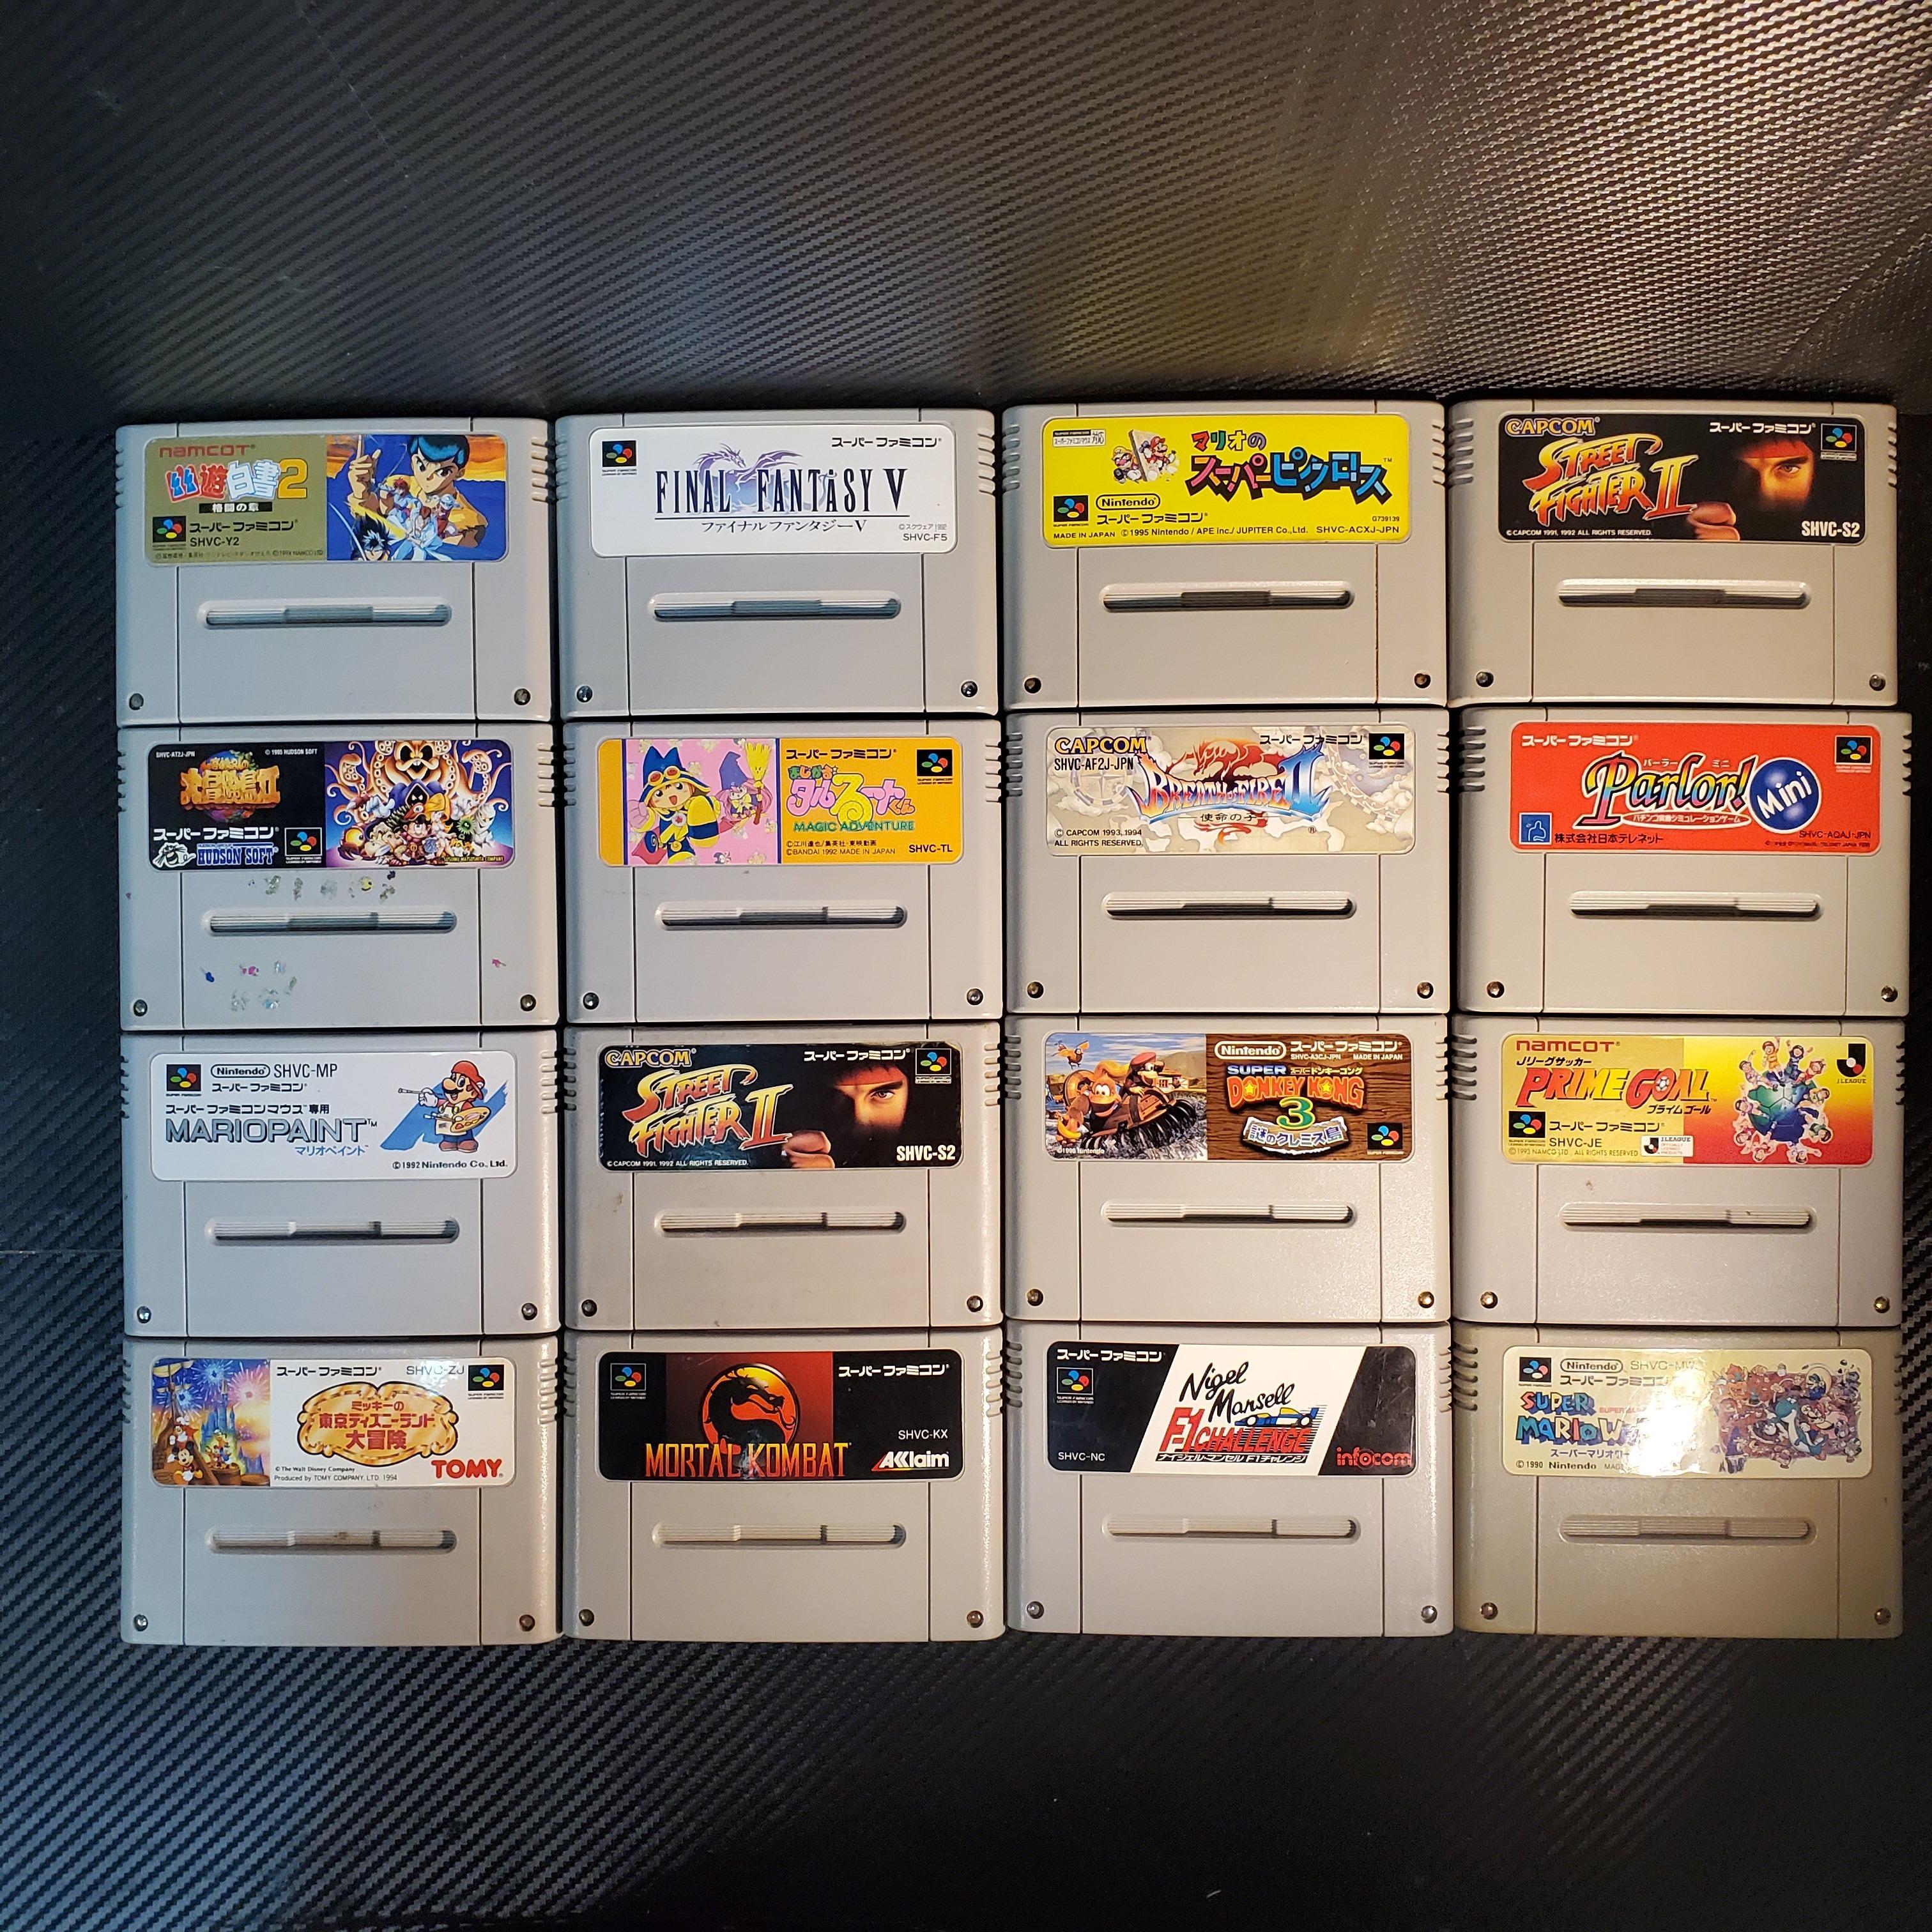 [VDS] Nostalgeek Store — Super Famicom / GBA / GB / Nintendo 64 / GameCube 201005105019676131